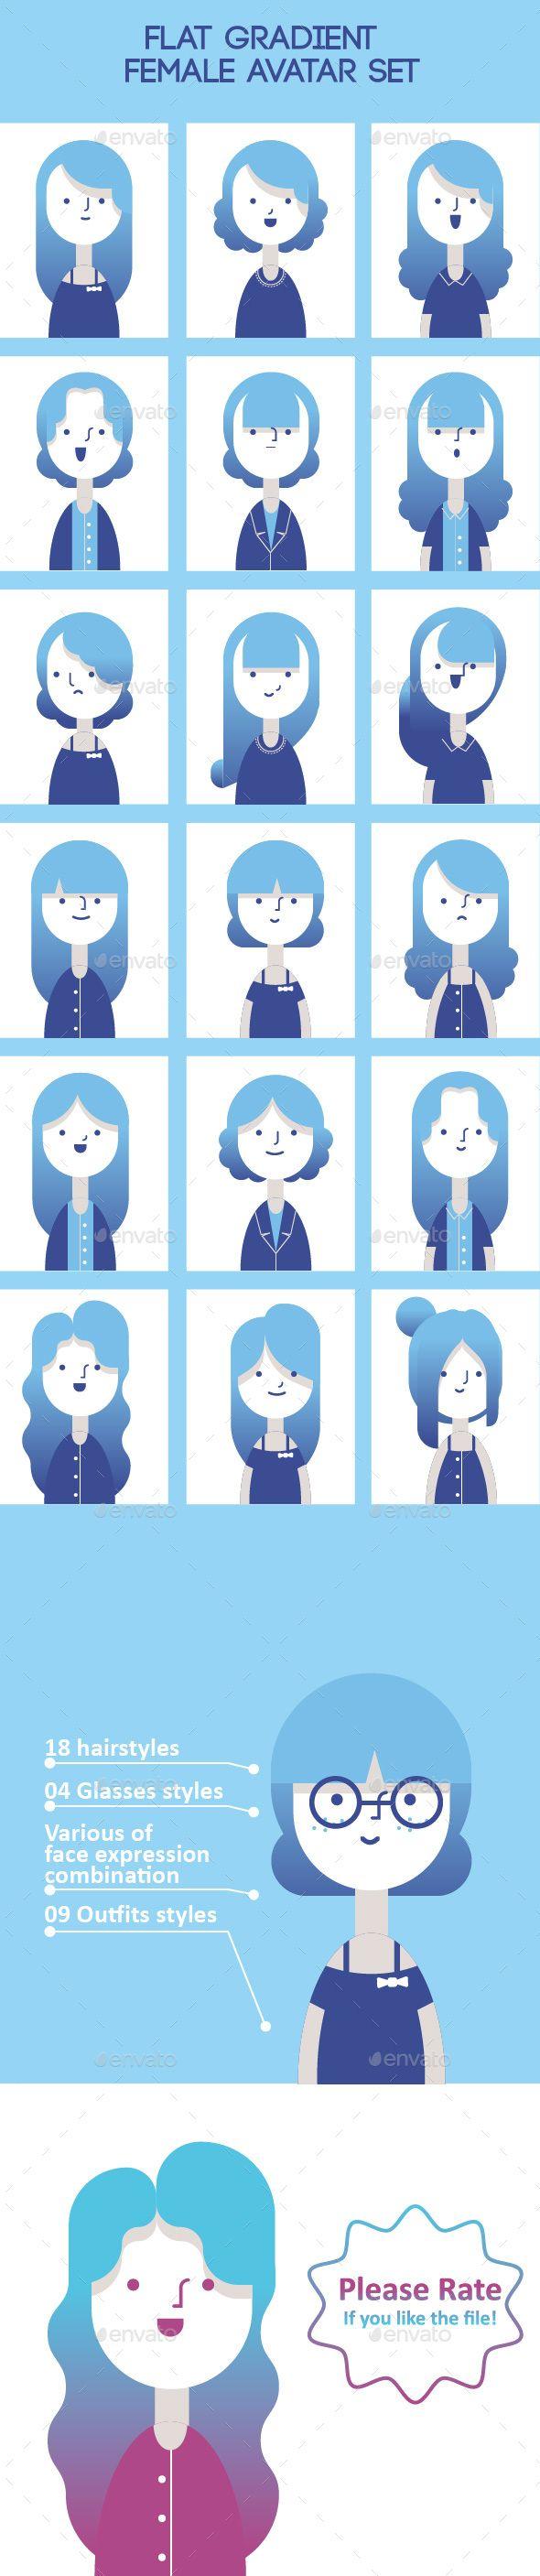 Flat Gradient Female Avatar Set - People Characters